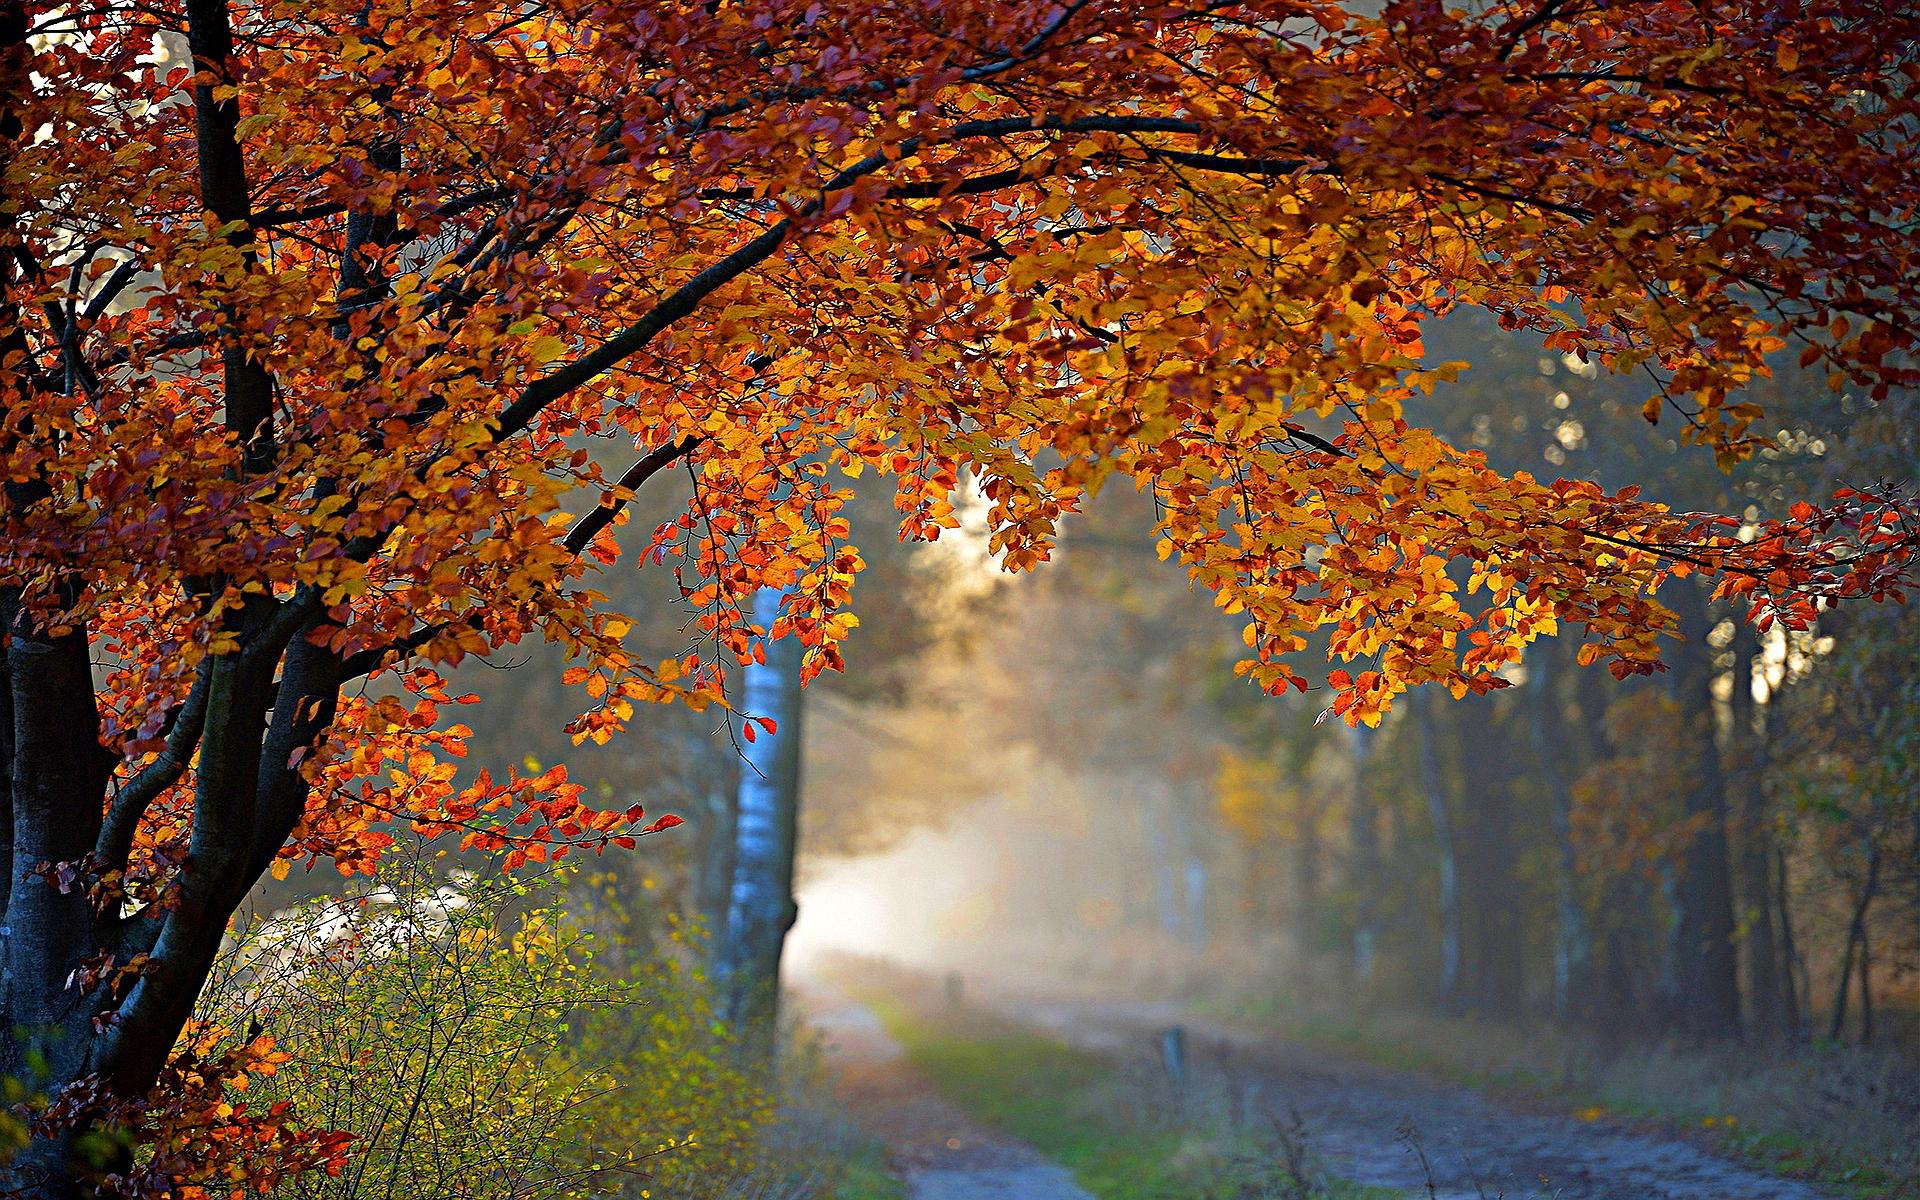 Water Falling Live Wallpaper Download Autumn Foliage Road Hd Desktop Wallpapers 4k Hd